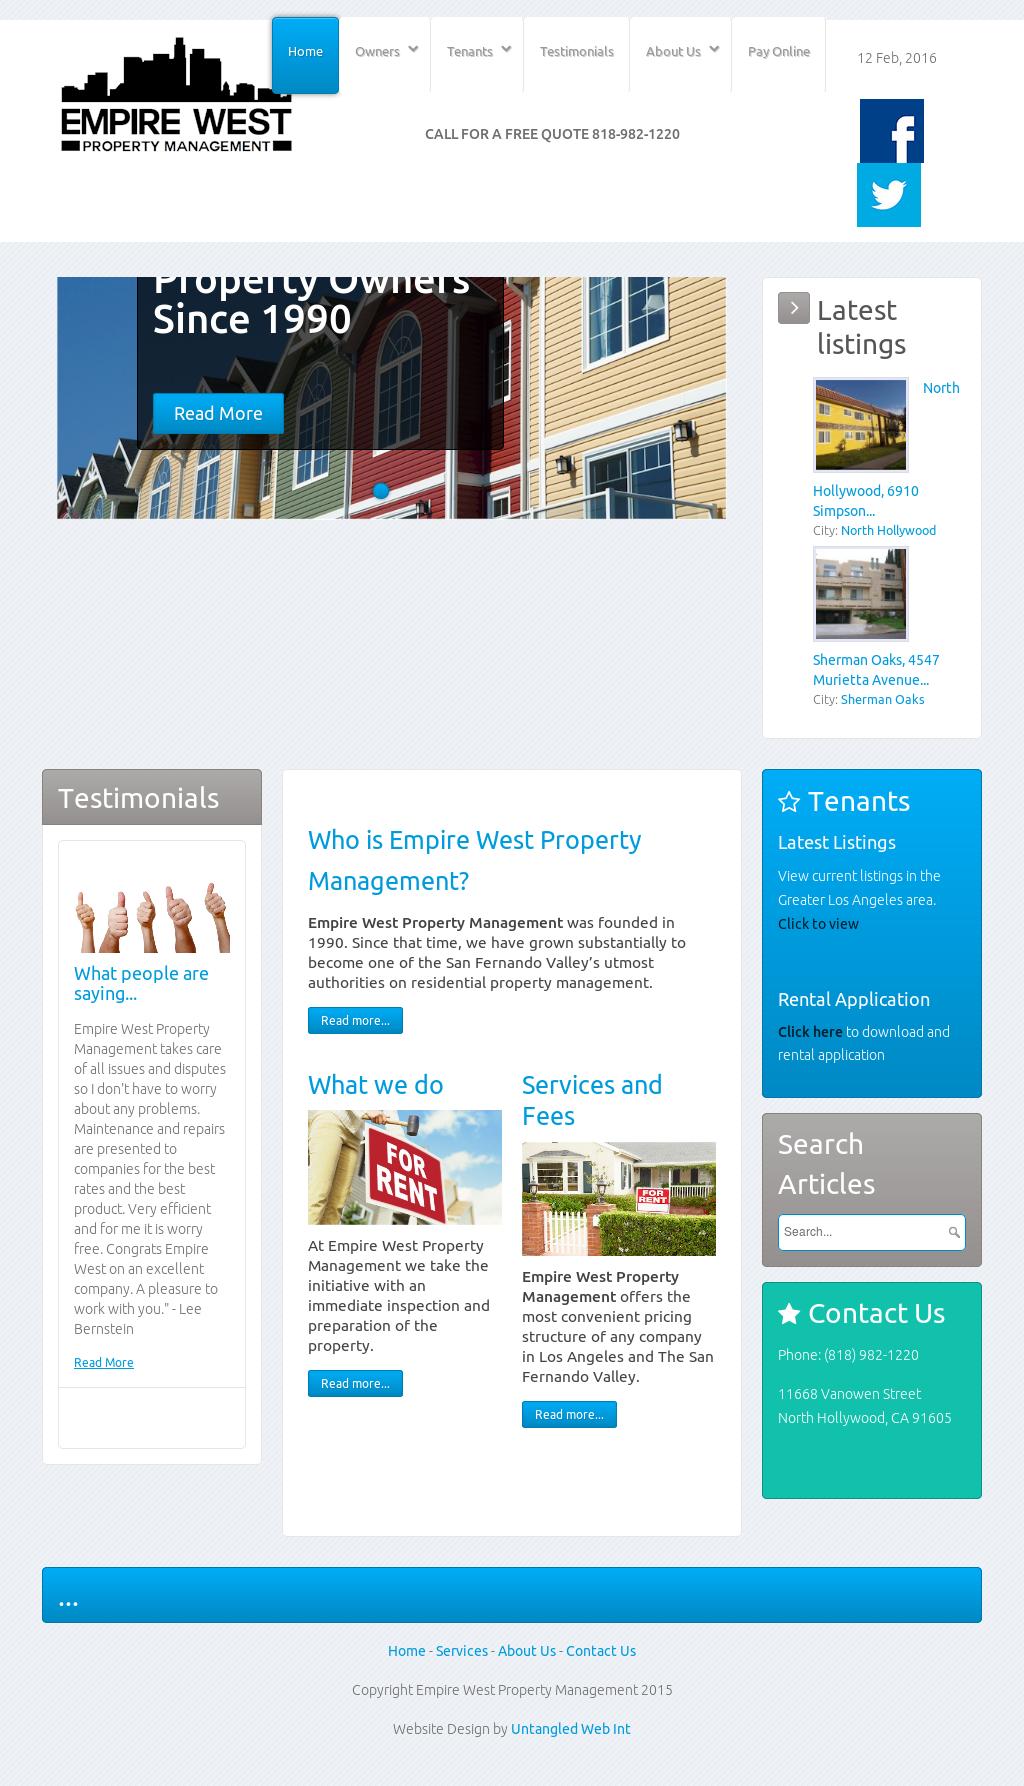 Empire West Property Management Competitors, Revenue and